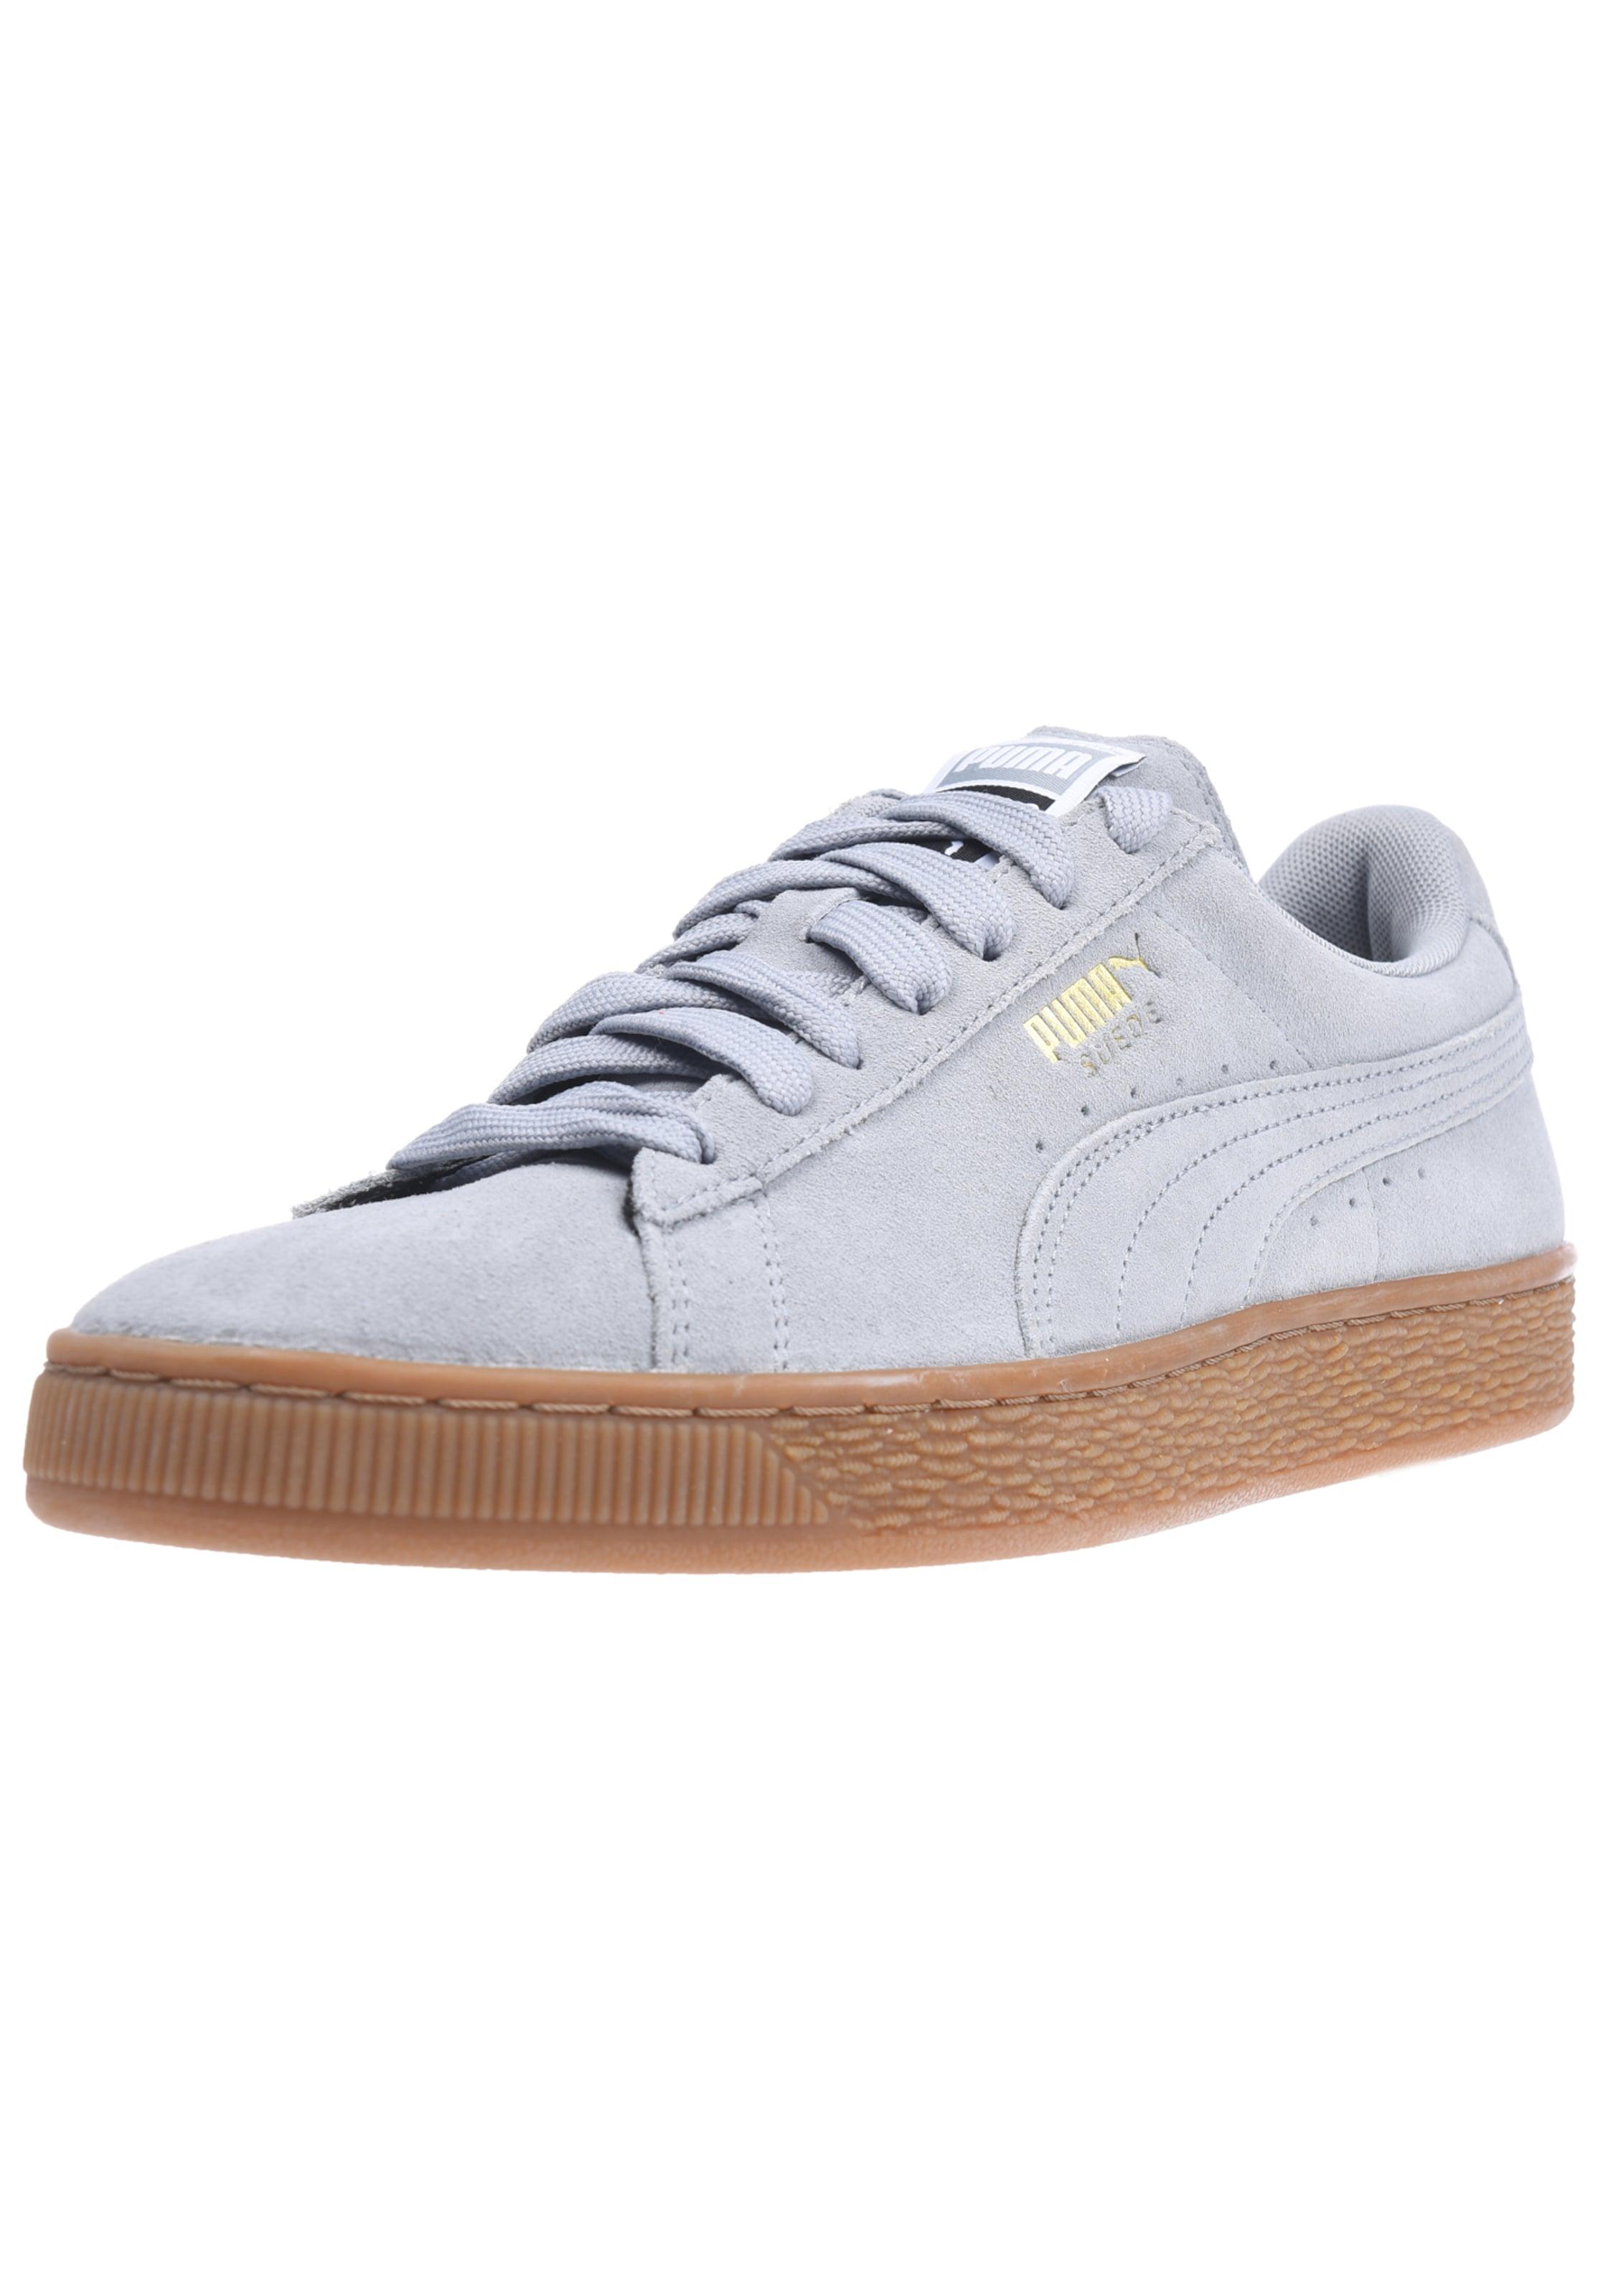 PUMA Suede Classic Gum Sneaker Hohe Qualität